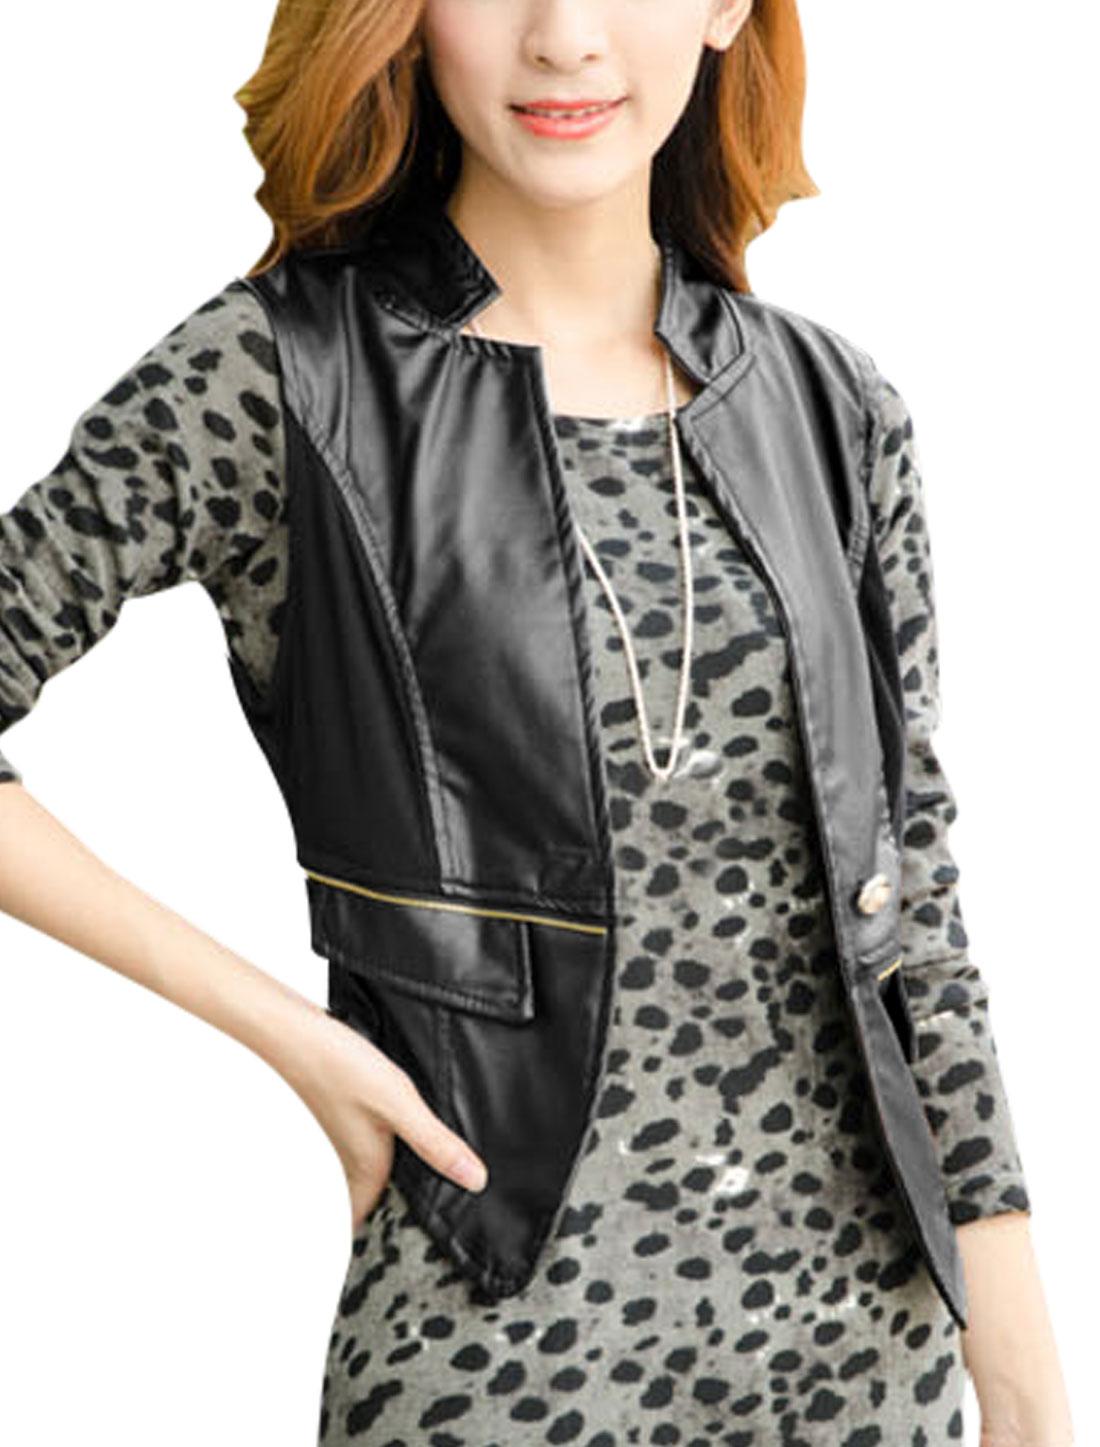 Lady Button Closure Spliced Applique Back Imitation Leather Gilet Black XS